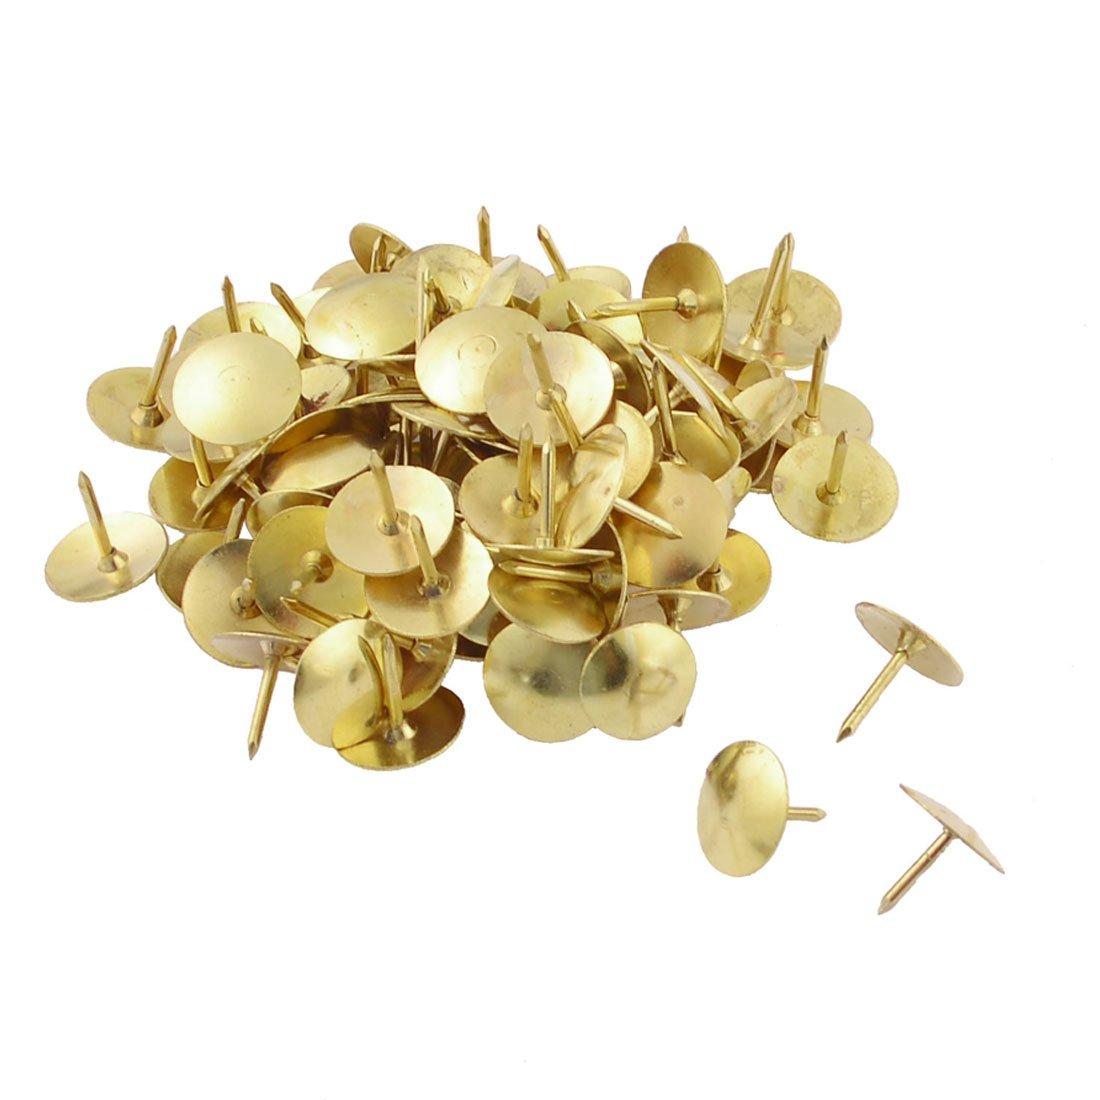 uxcell 100 Pcs Pack Office Gold Tone Thumbtacks Drawing Pins a13041200ux0084